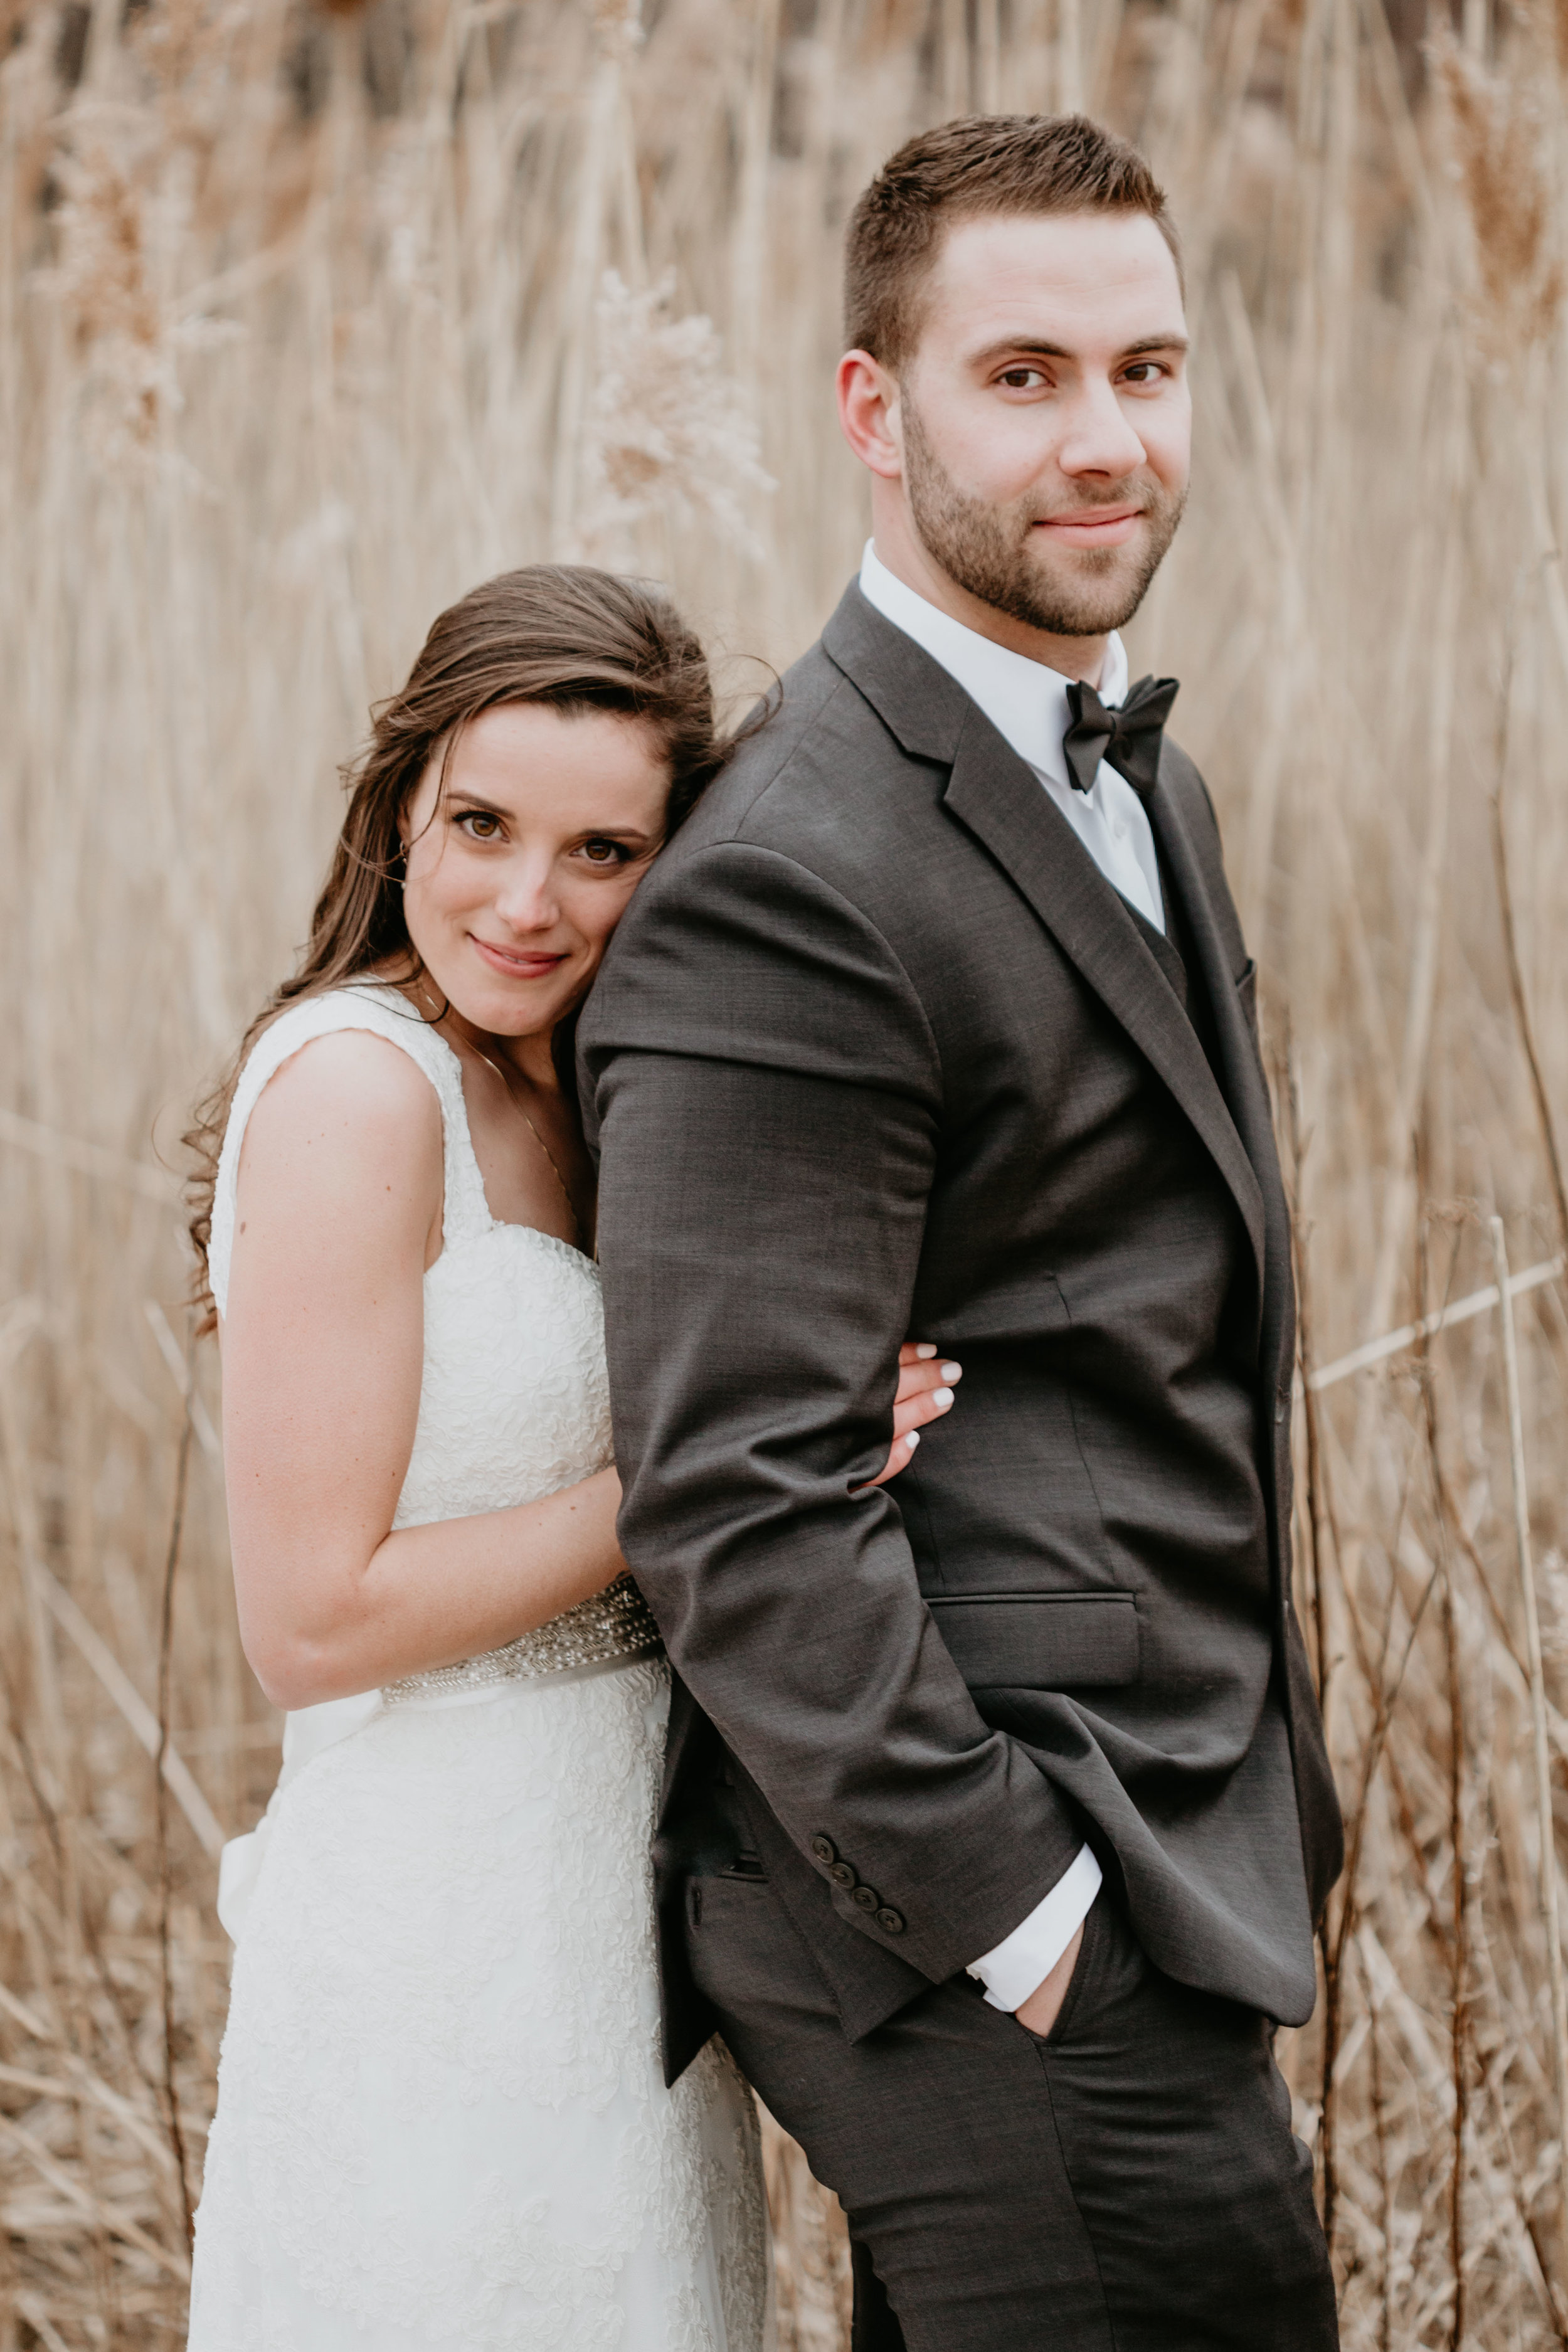 nicole-daacke-photography-boston-massachusetts-seaside-intimate-winter-wedding-photographer-45.jpg